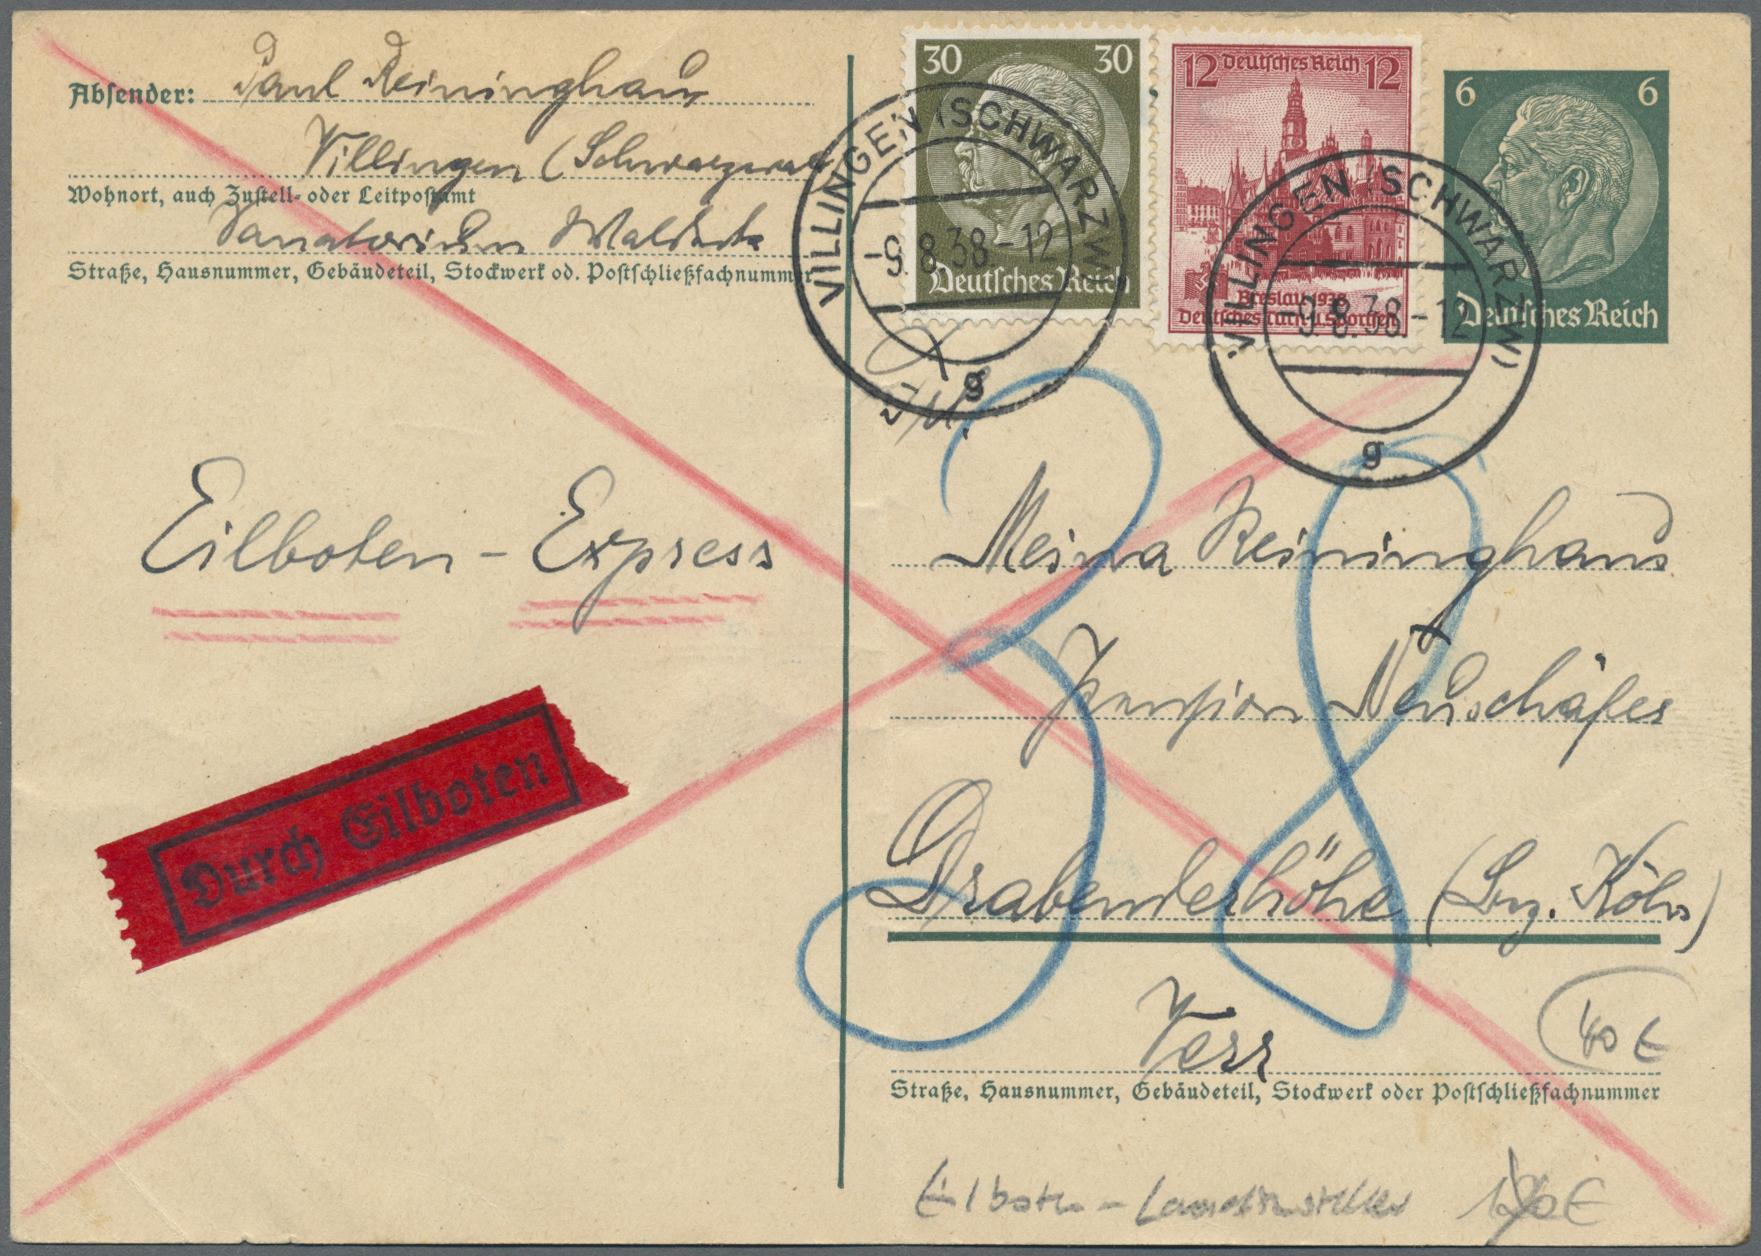 Lot 37176 - Deutsches Reich - Besonderheiten  -  Auktionshaus Christoph Gärtner GmbH & Co. KG Collections Germany,  Collections Supplement, Surprise boxes #39 Day 7